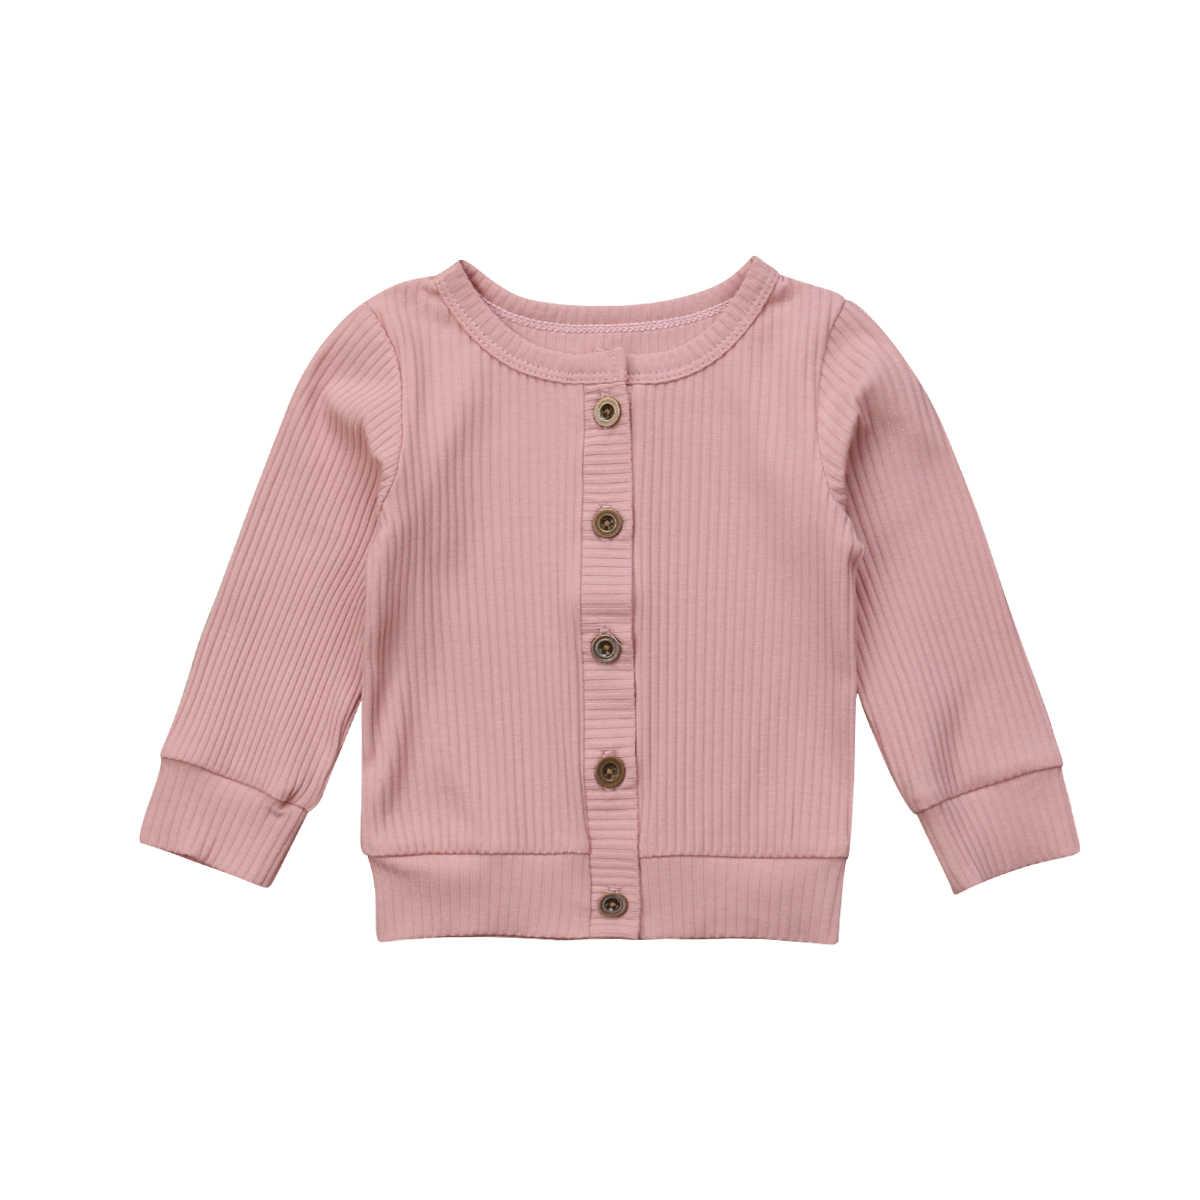 Baby Lente Herfst Vest Kleding Pasgeboren Baby Baby Girl Lange Mouwen Gebreide Trui Jas Tops Button Kleding